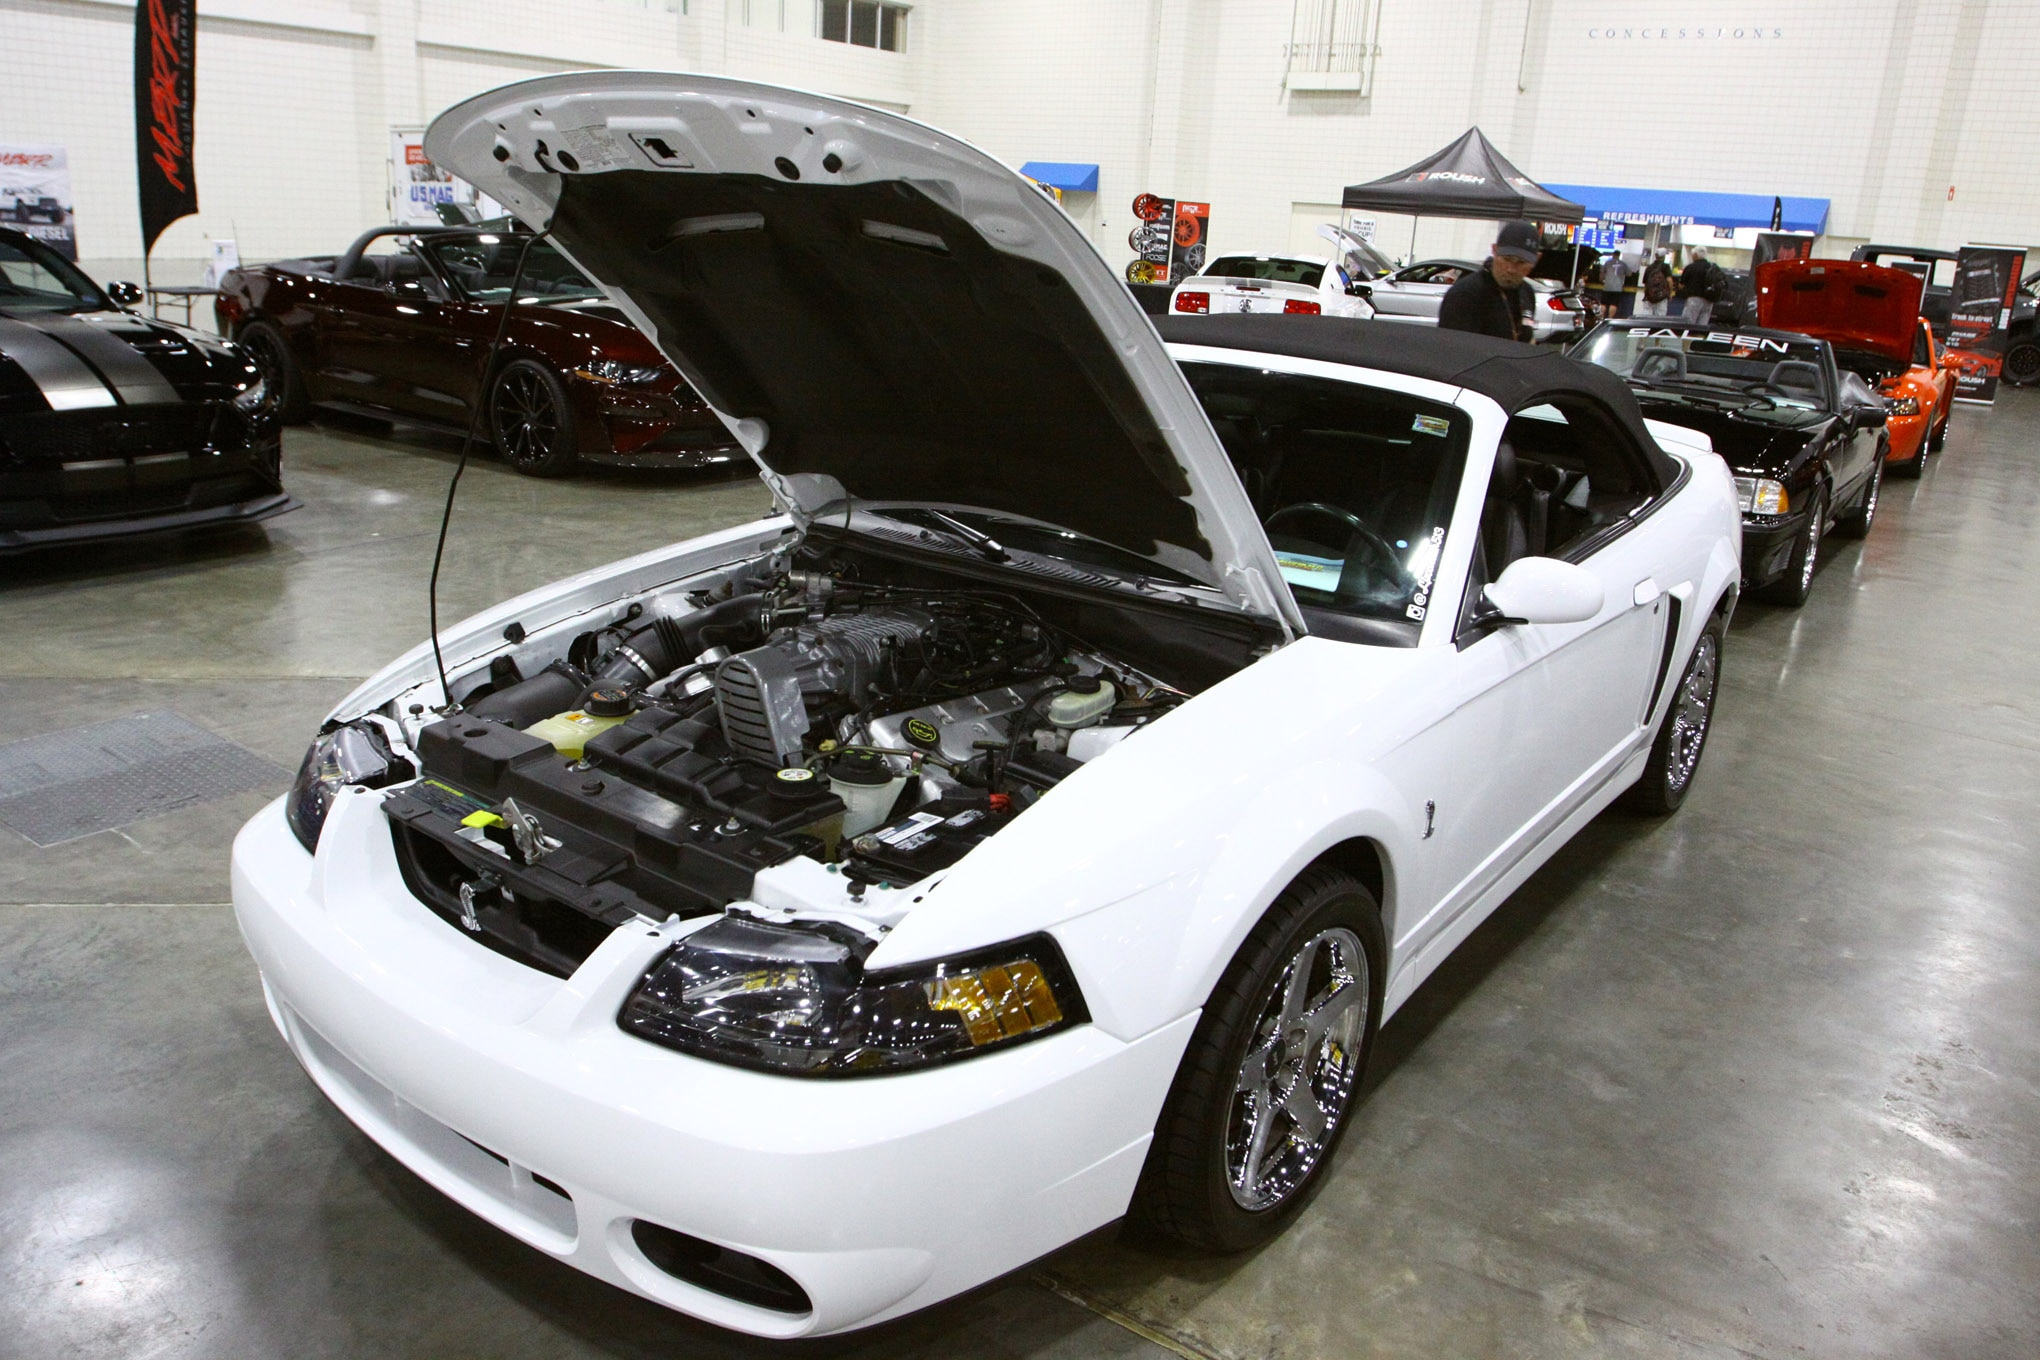 Friday CJ Pony Parts Mustang Week Car Show 153